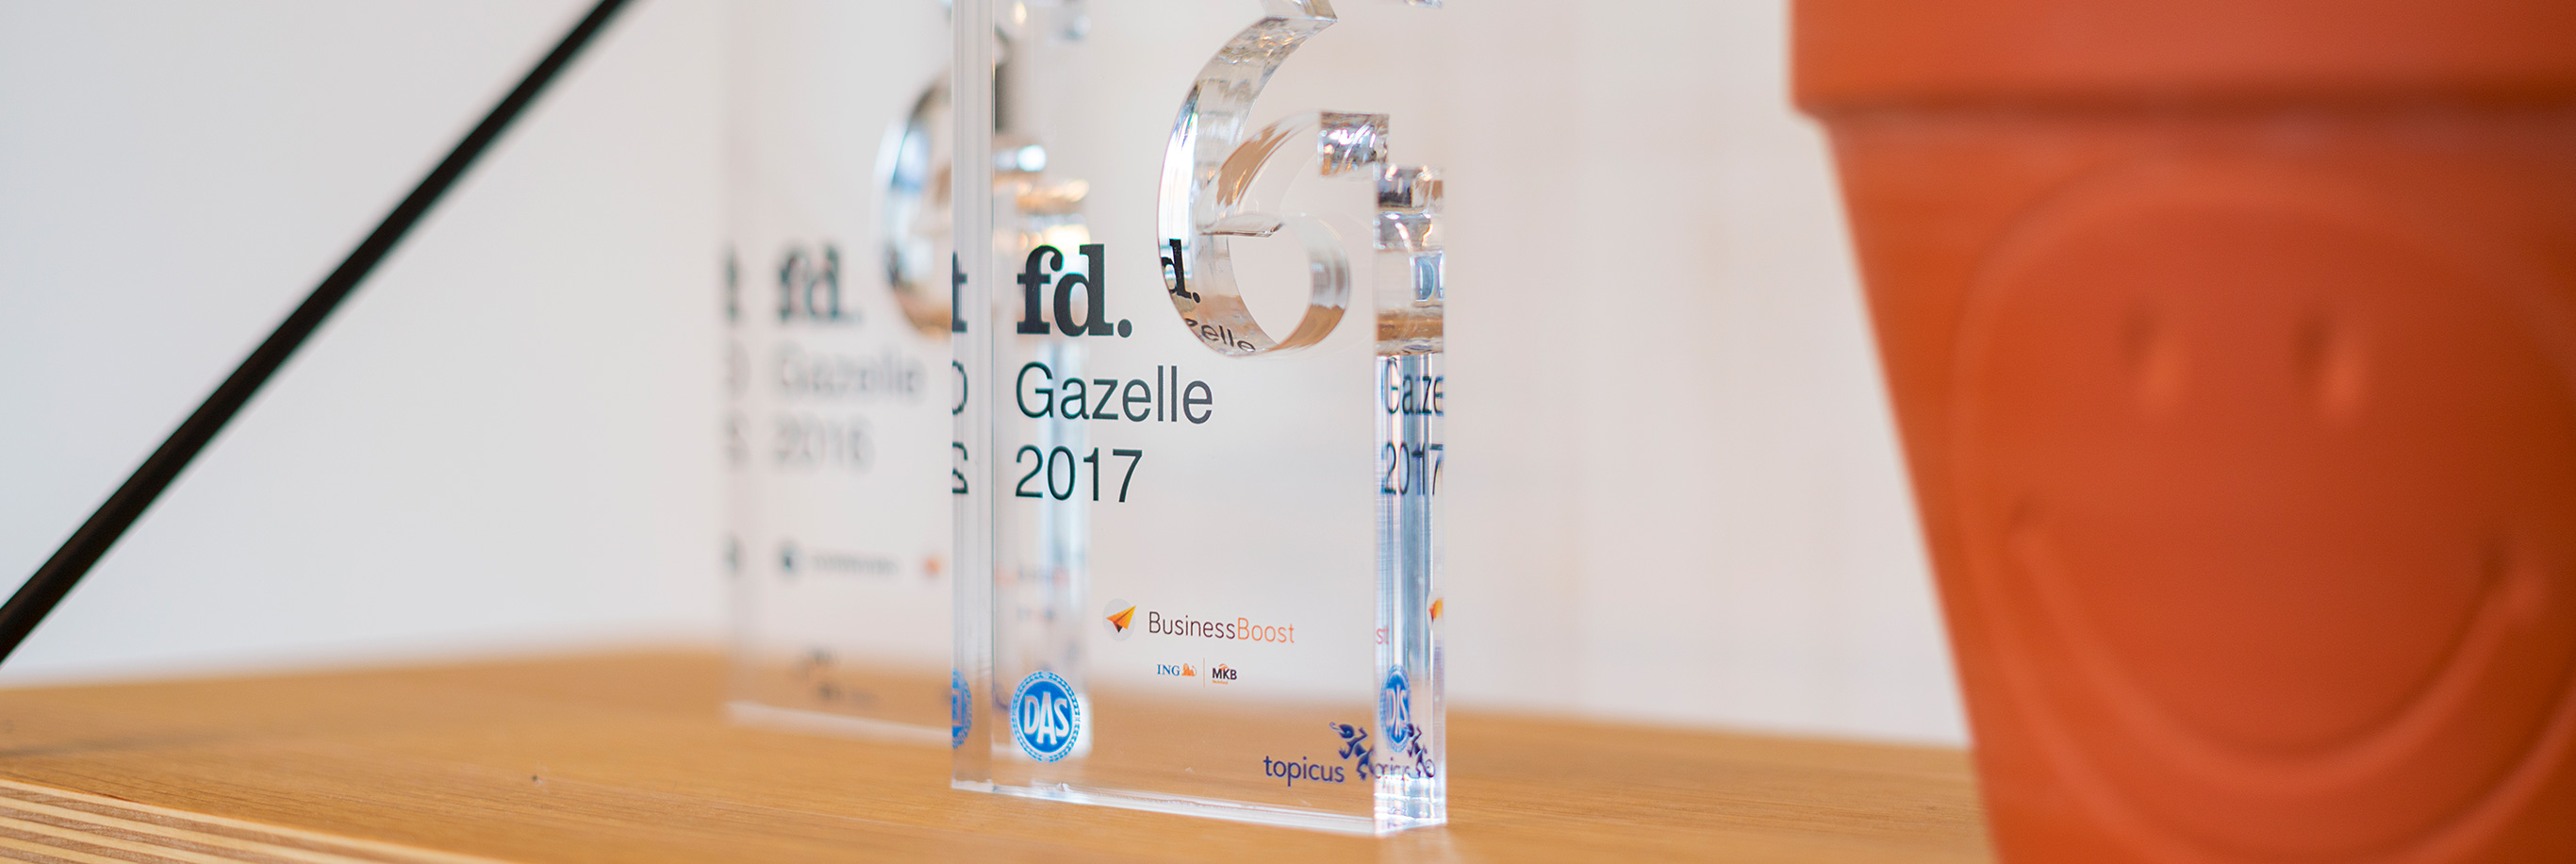 Engagement Factory wins FD Gazelle